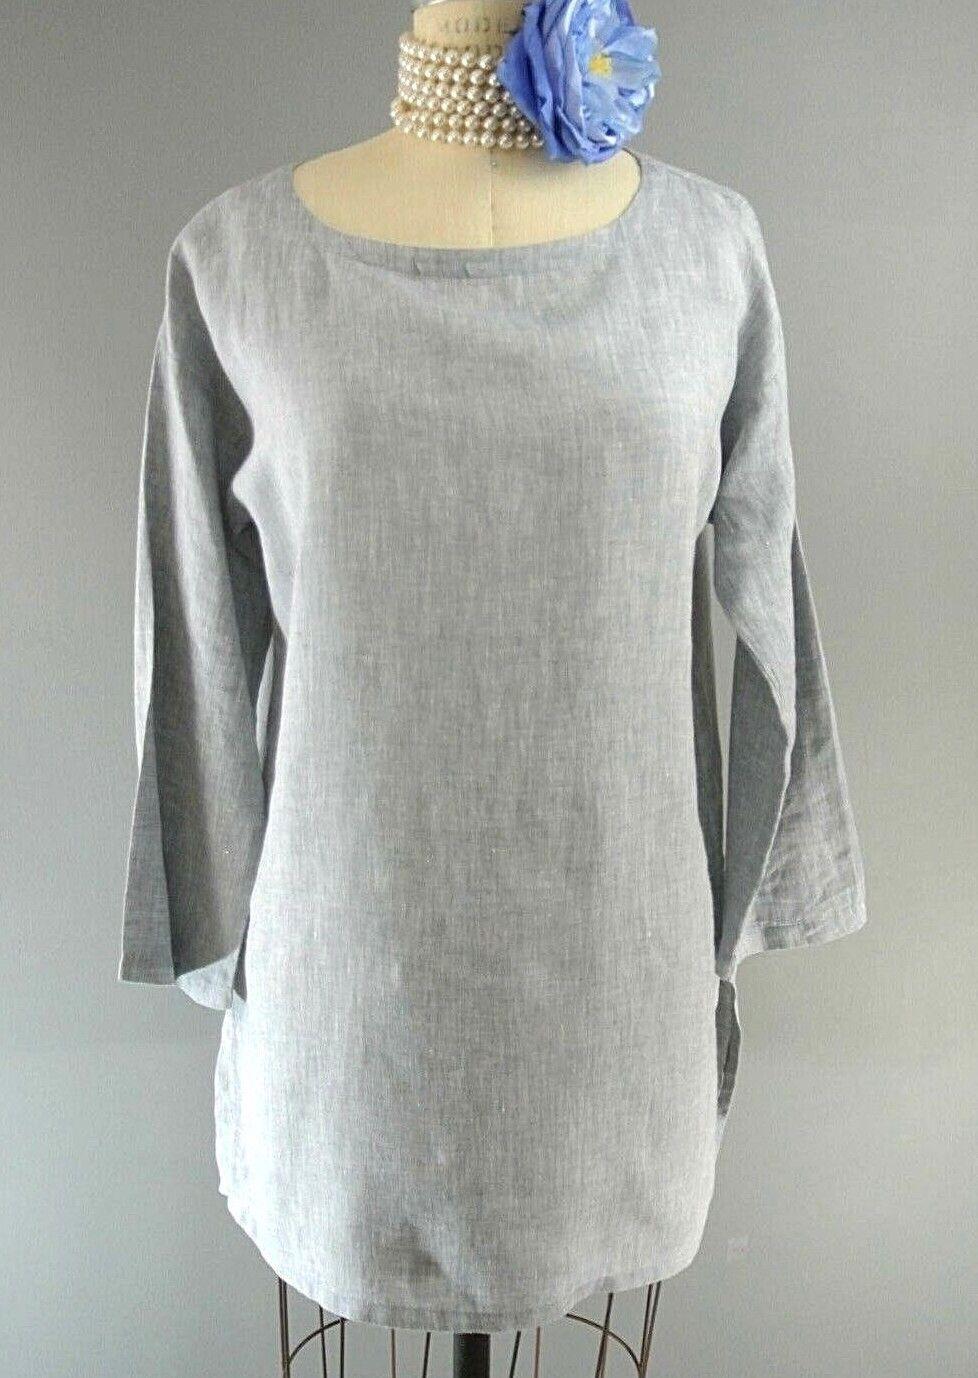 Eileen Fisher Organic Linen Long Sleeve Blouse Petite M P Tunic Top